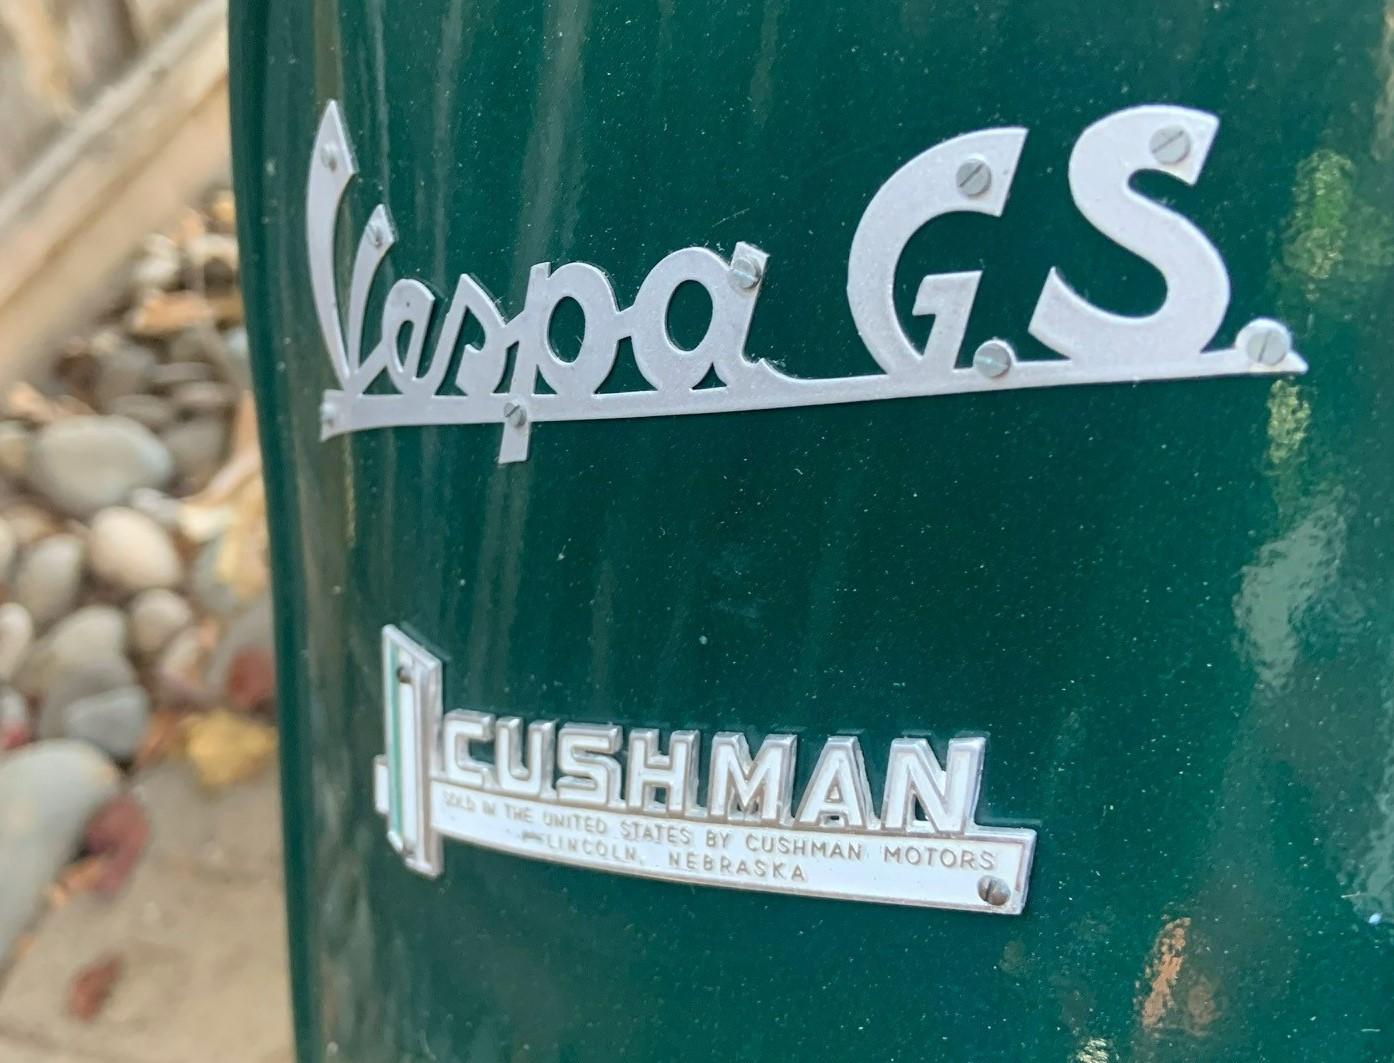 Josh Rogers - 1961 Cushman GS - Close-up front